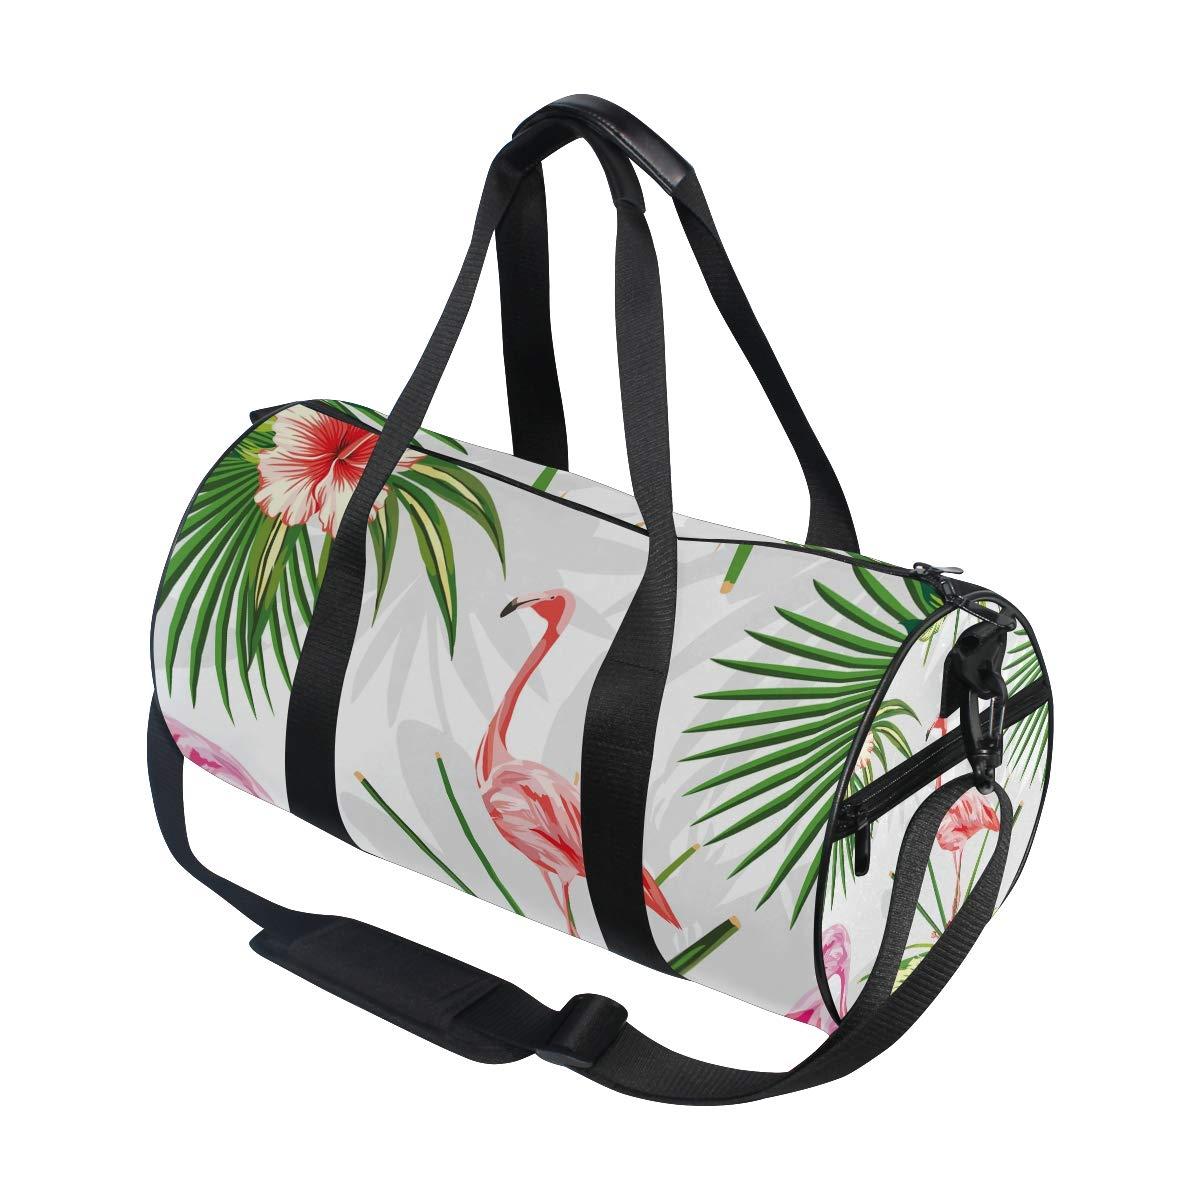 Flamingo Sports Gym Bag Travel Duffel Bag with Pockets Luggage & Travel Gear Shoulder Strap Fitness Bag by EVERUI (Image #3)